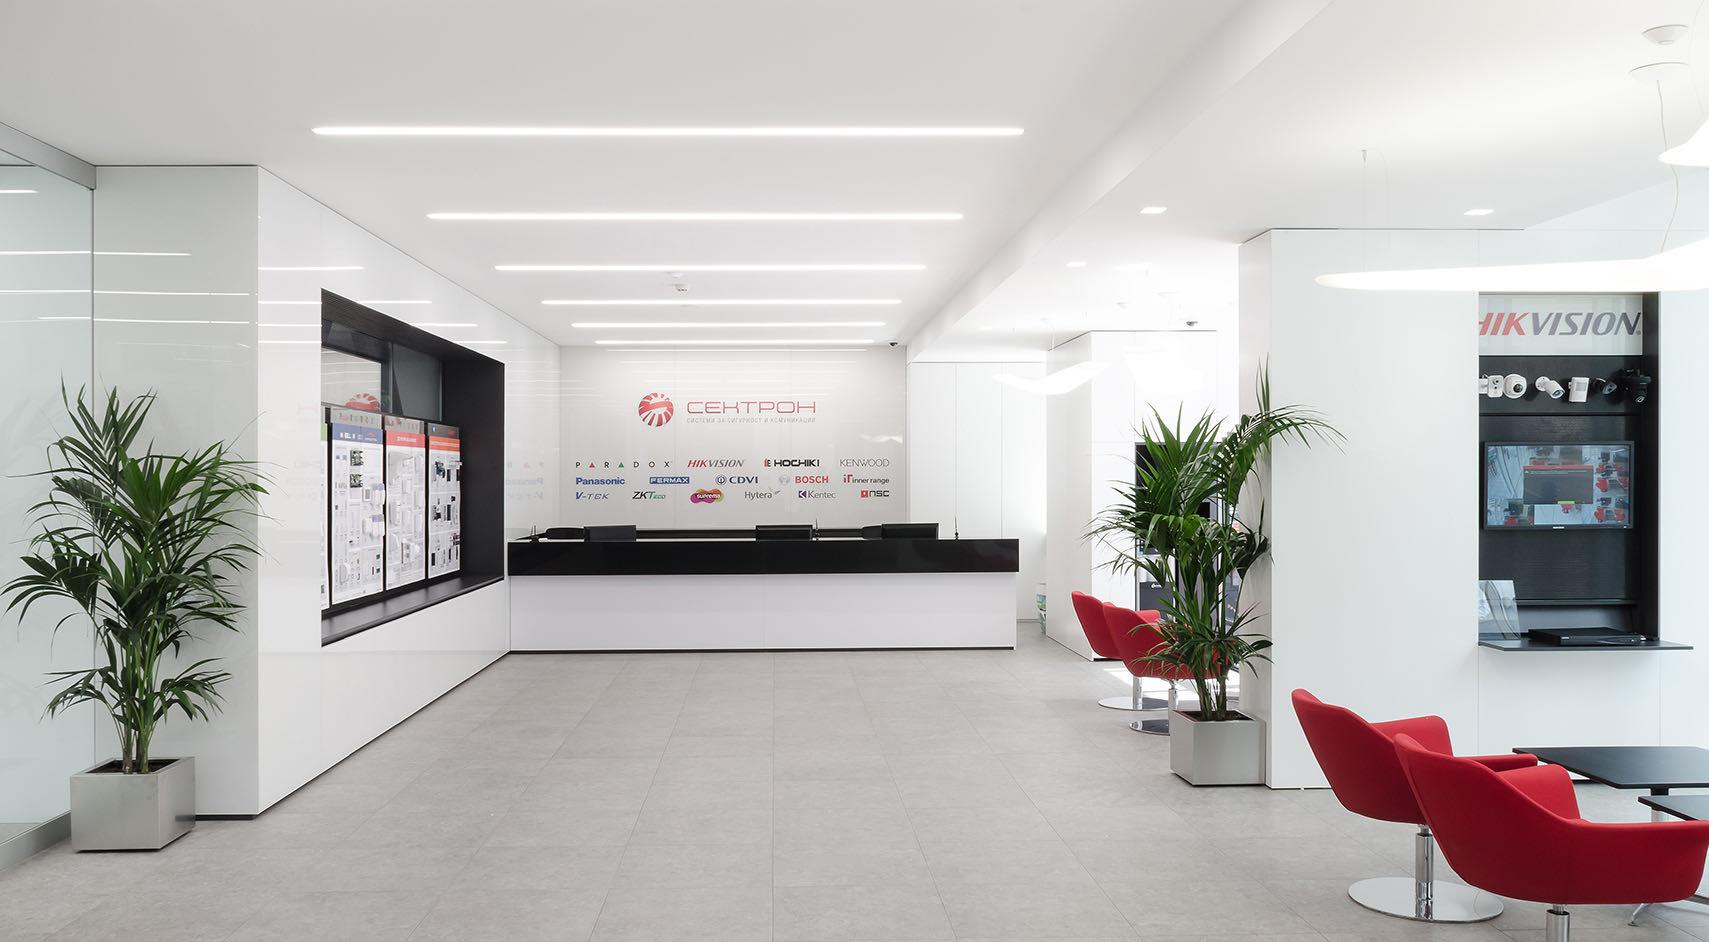 sectron-officee-sofia-11